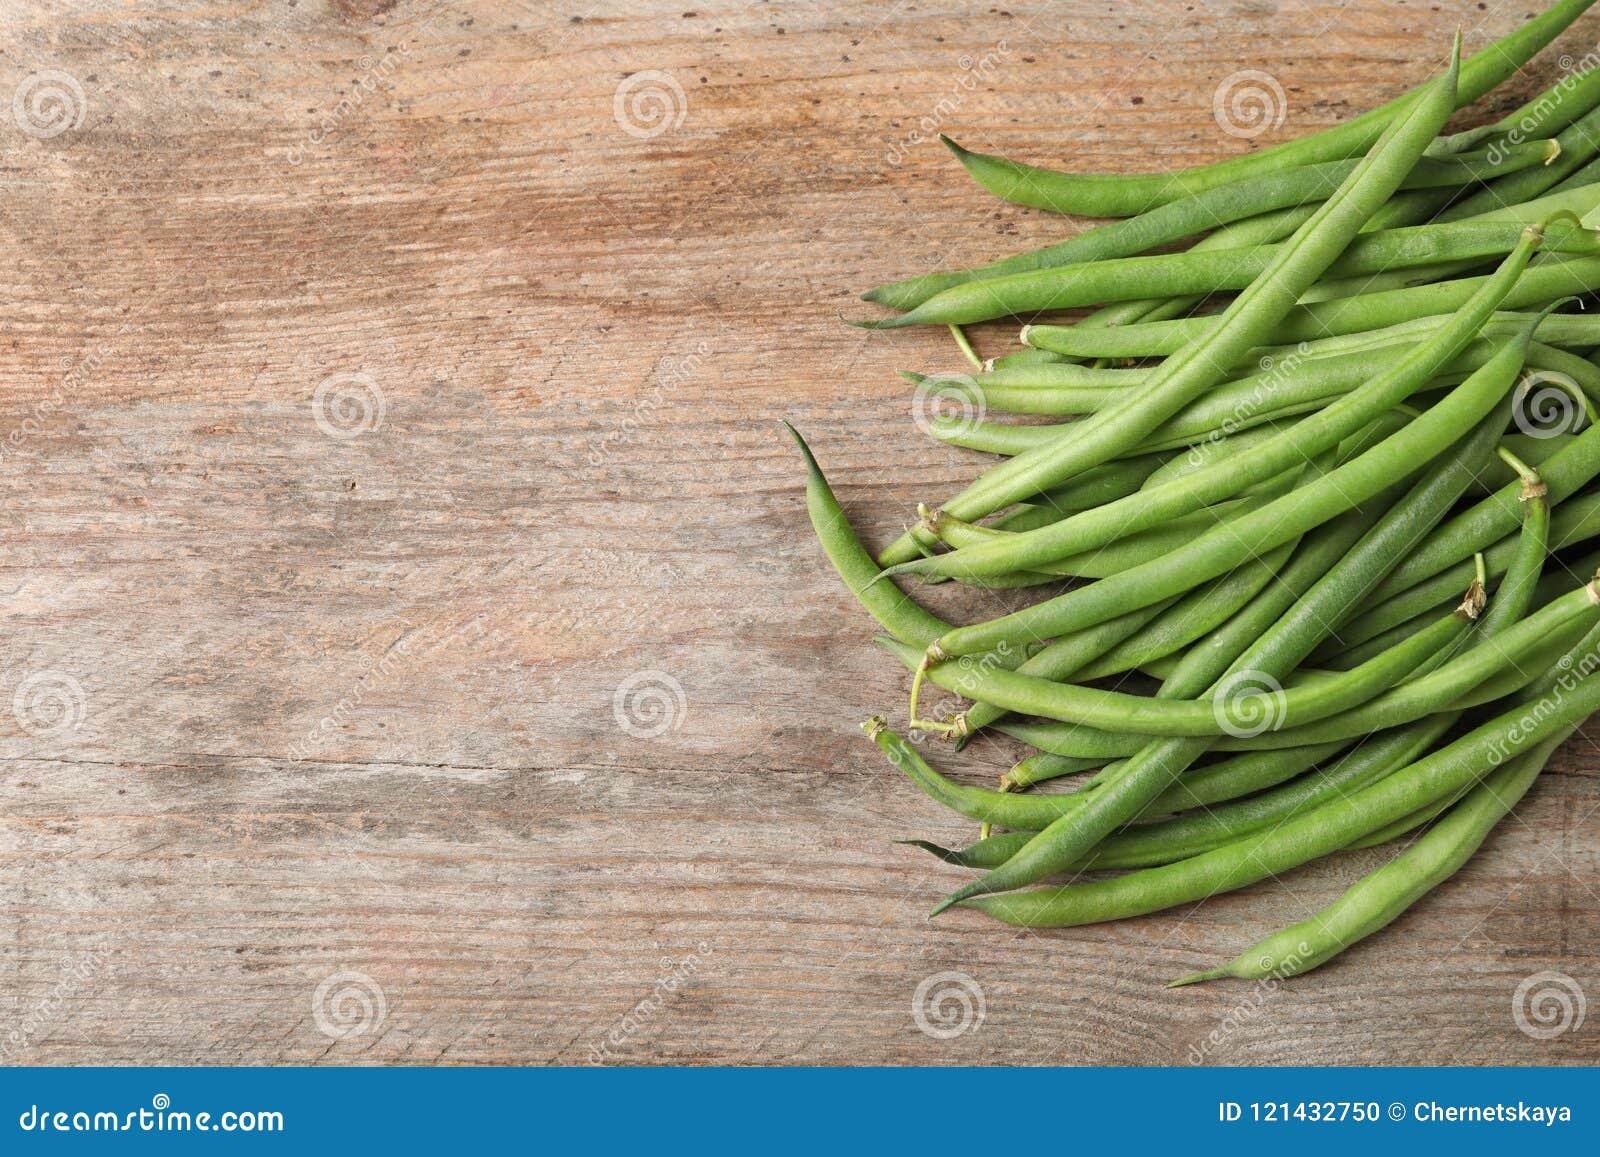 Fresh green French beans